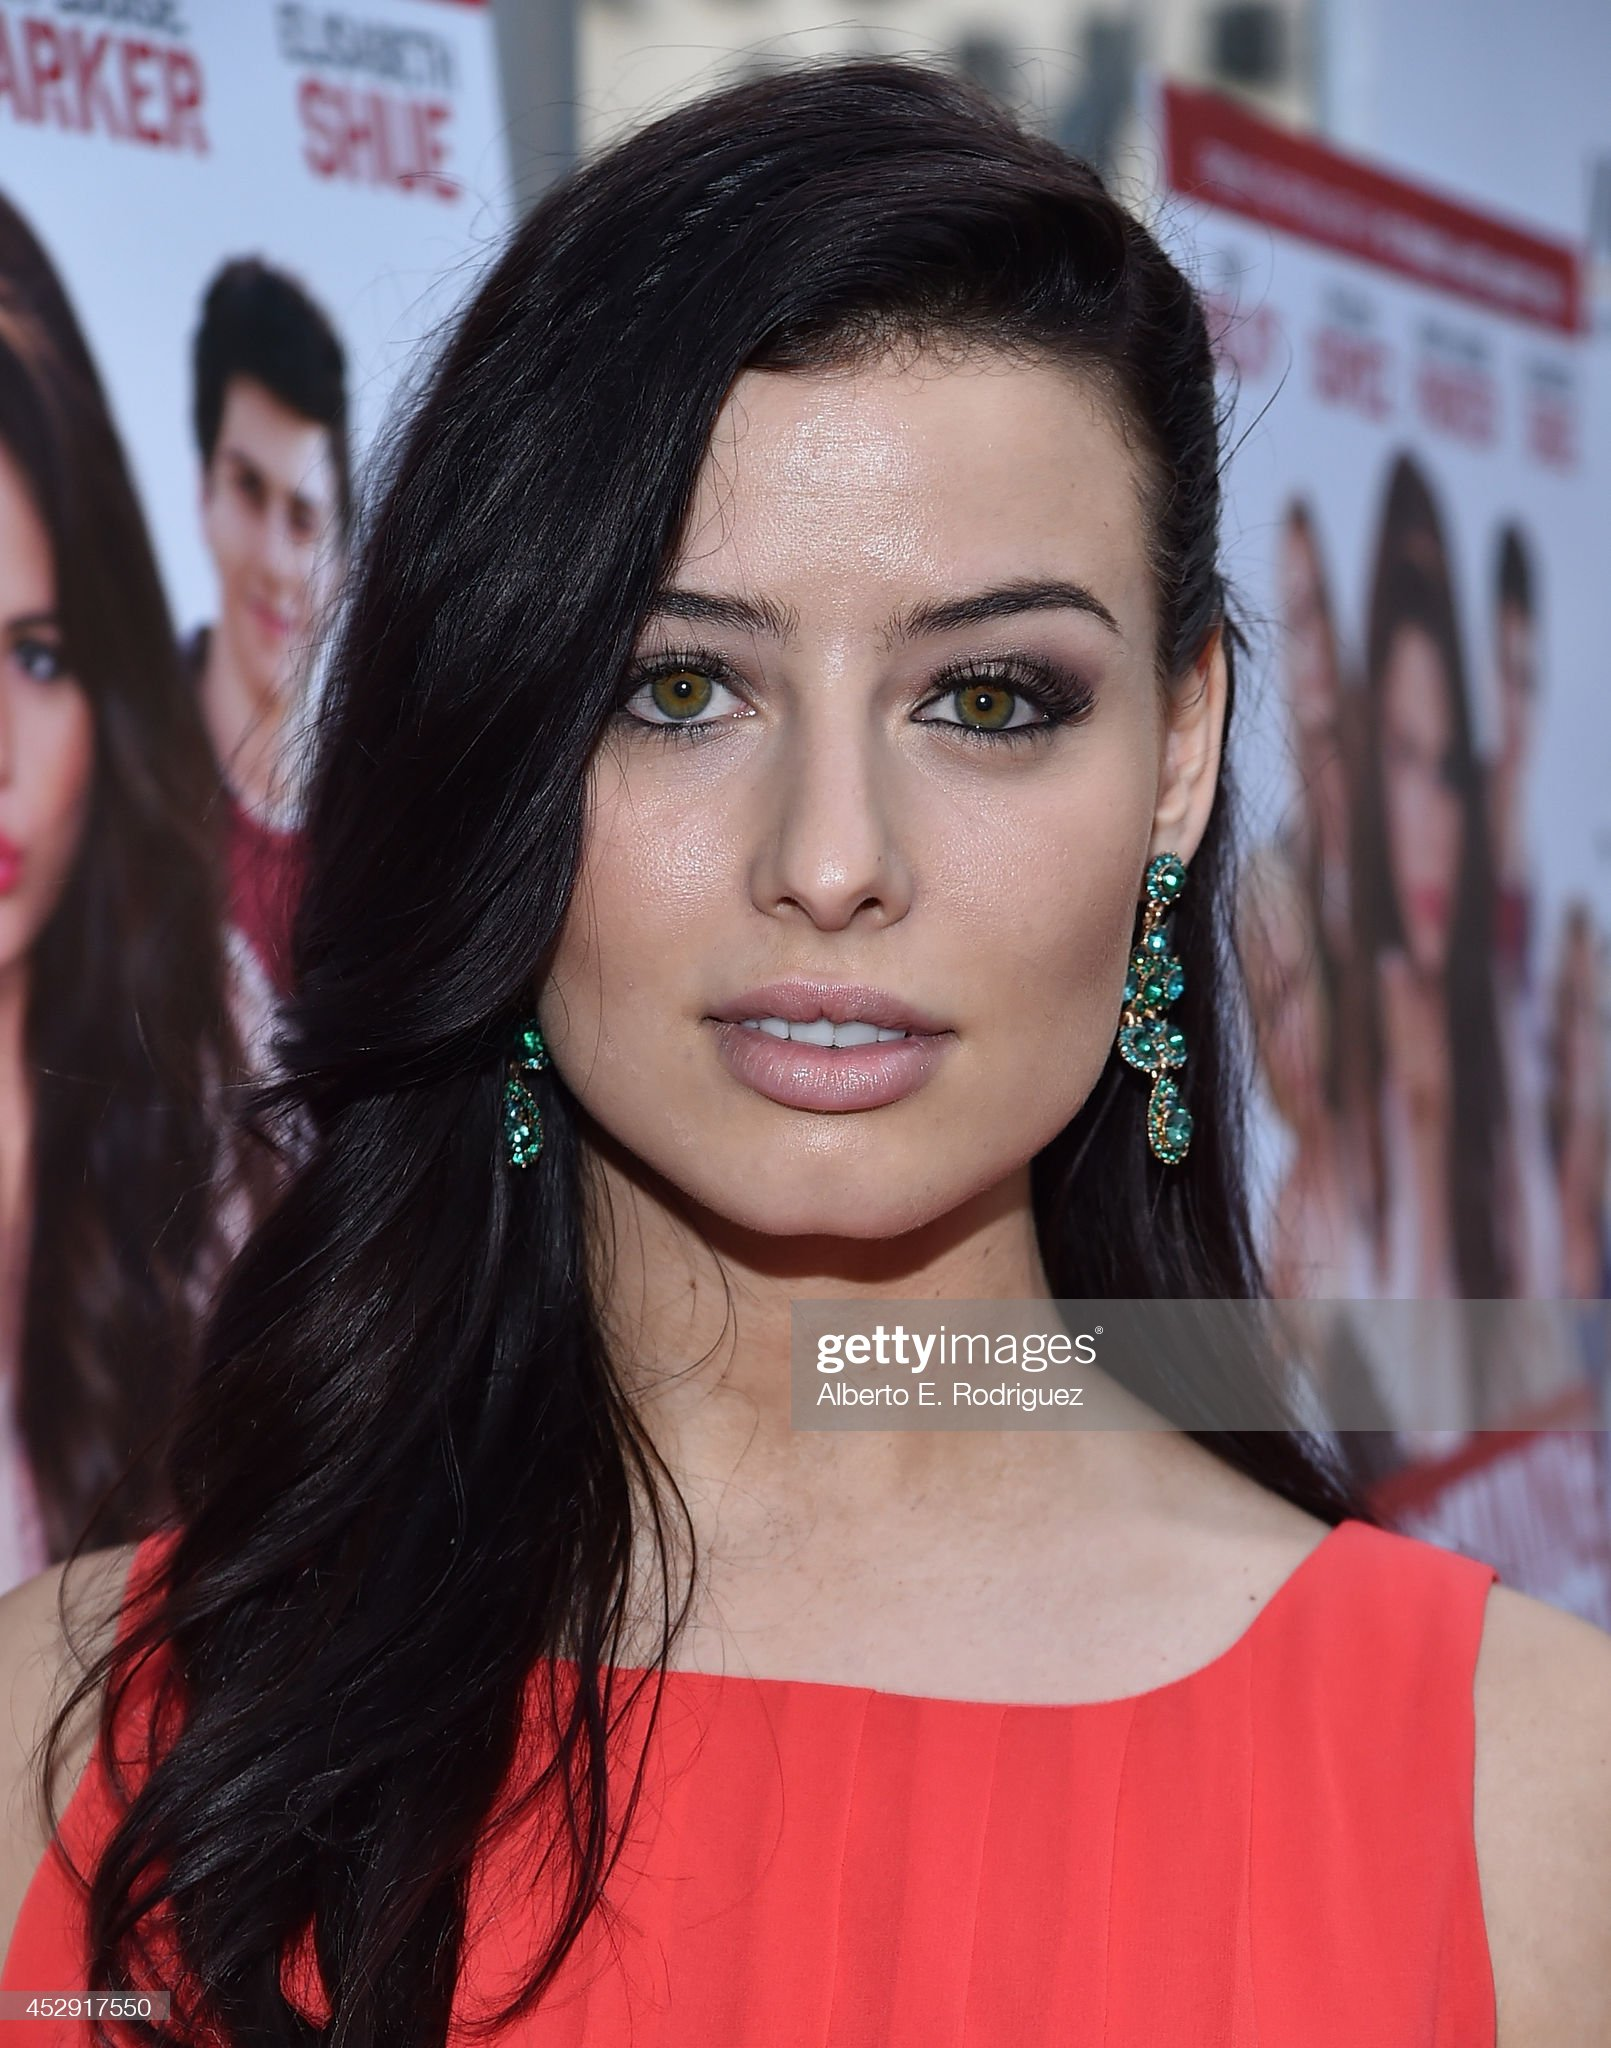 Hazel eyes - Personas famosas con los ojos de color AVELLANA Actress-nicole-shipley-arrives-to-the-premiere-of-mad-chances-badly-picture-id452917550?s=2048x2048